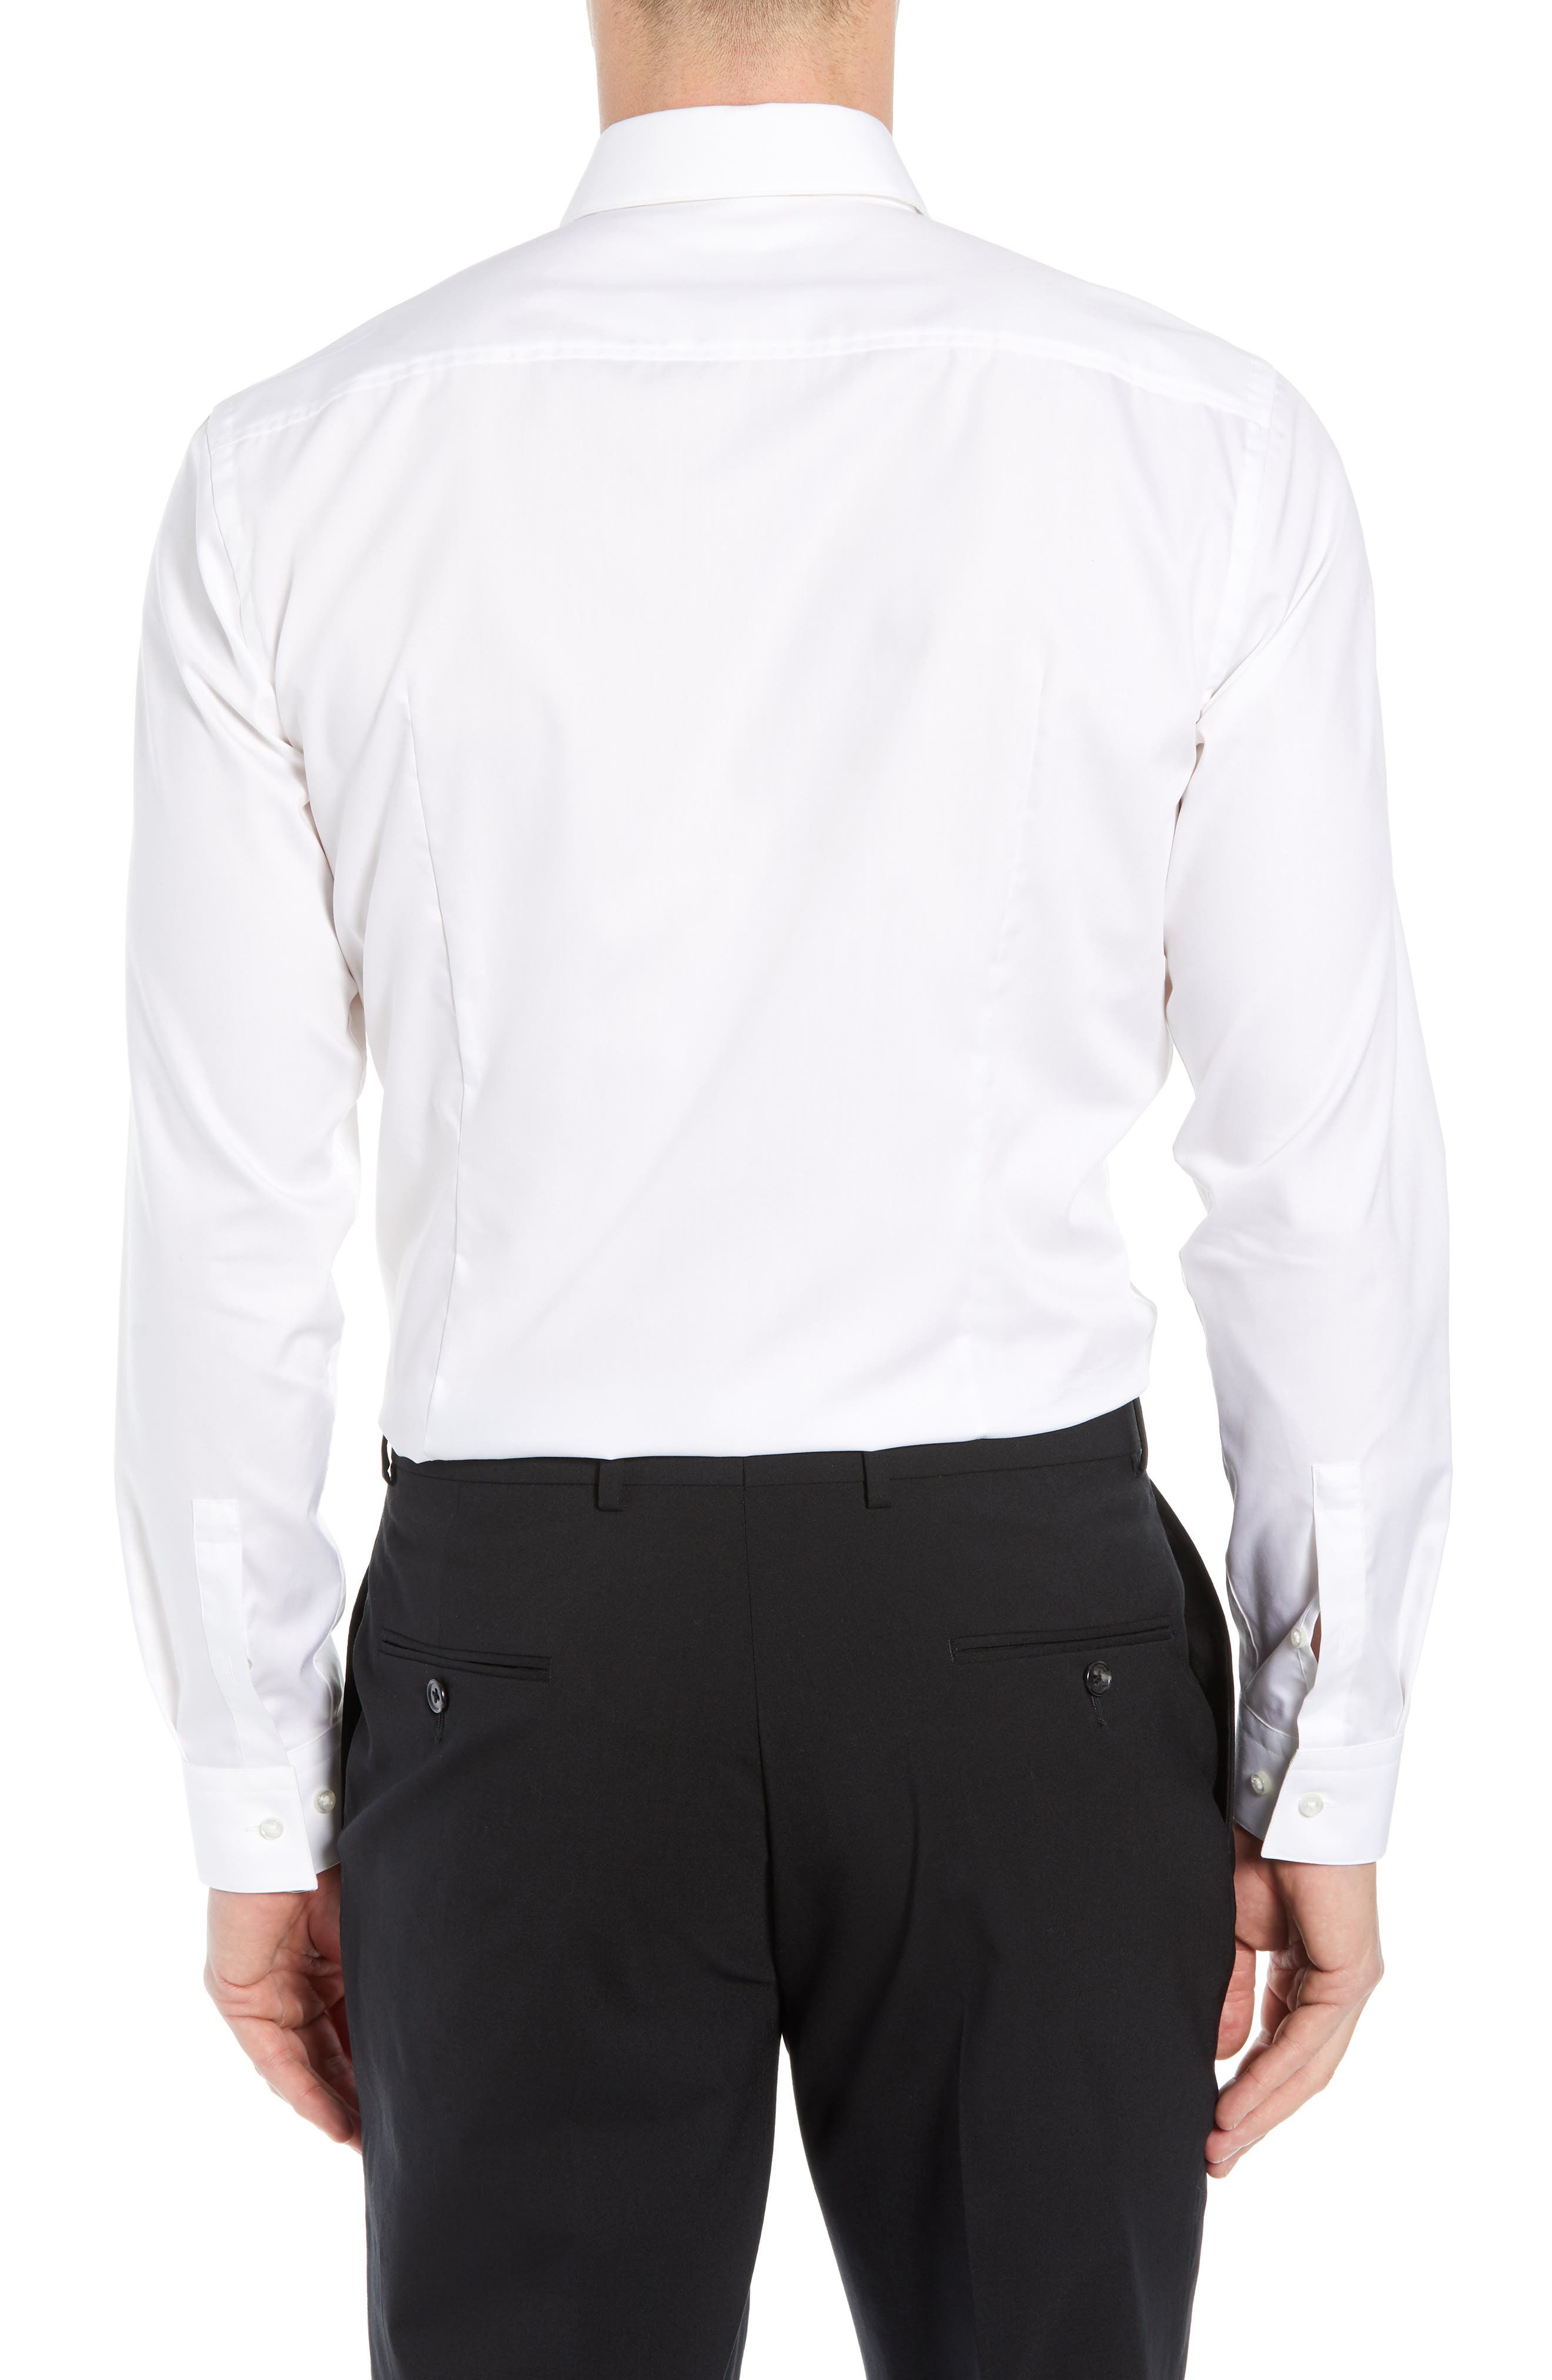 Jamir Slim Fit Easy Iron Solid Dress Shirt,                             Alternate thumbnail 3, color,                             100